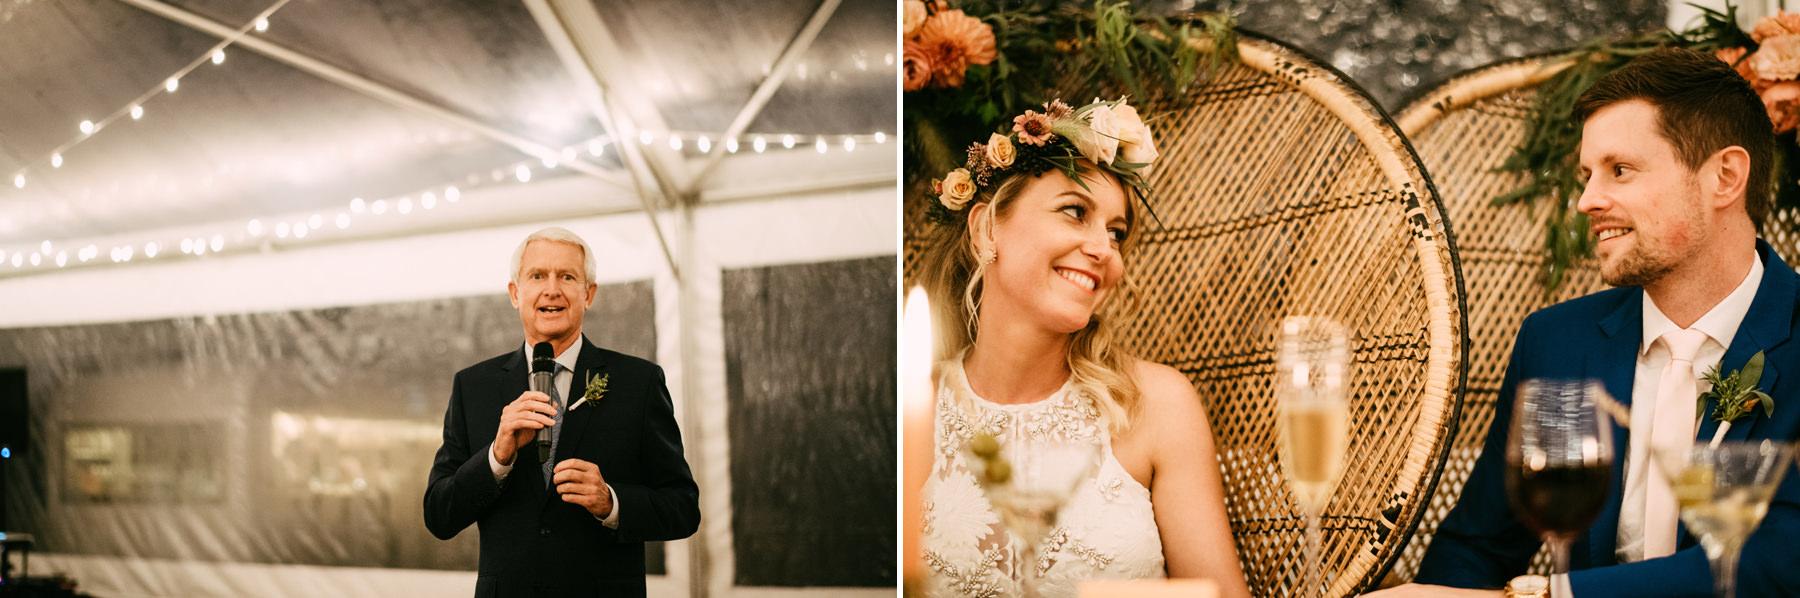 378-colorful-outdoor-lopez-island-wedding.jpg